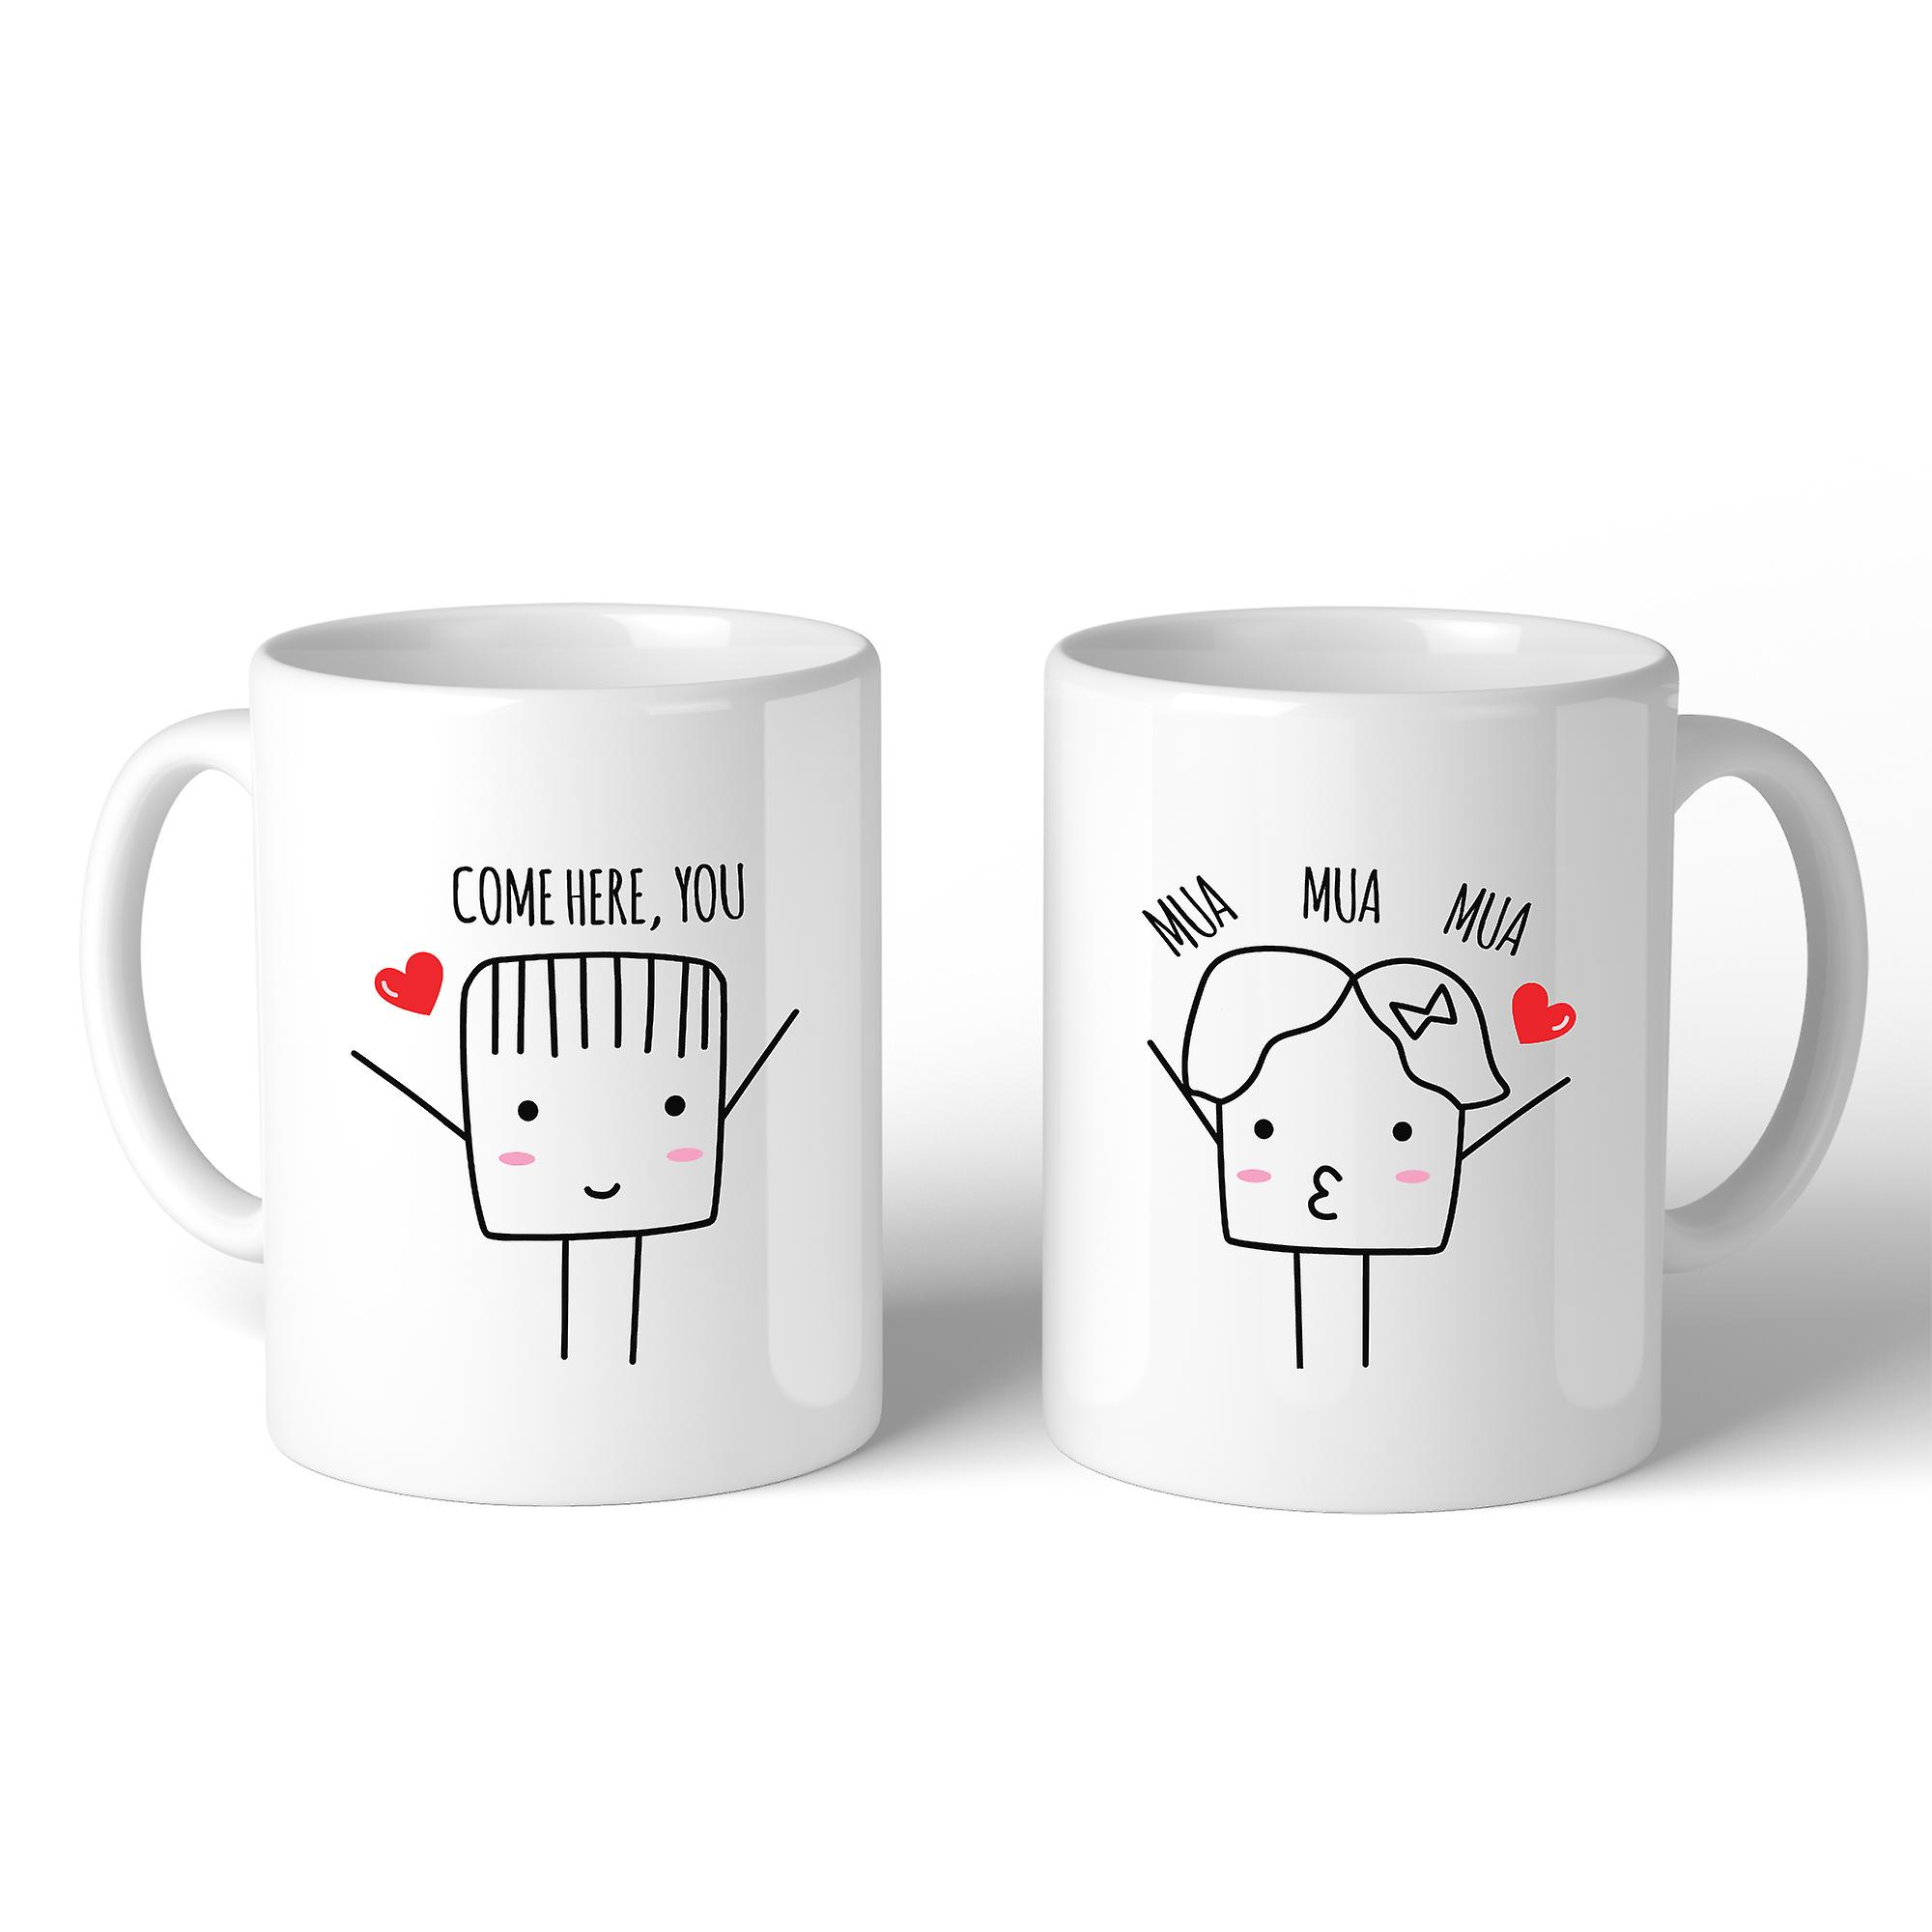 Come Here Mua Mua Mua White Matching Couple Mugs Cute Wedding Gifts Fruugo Au